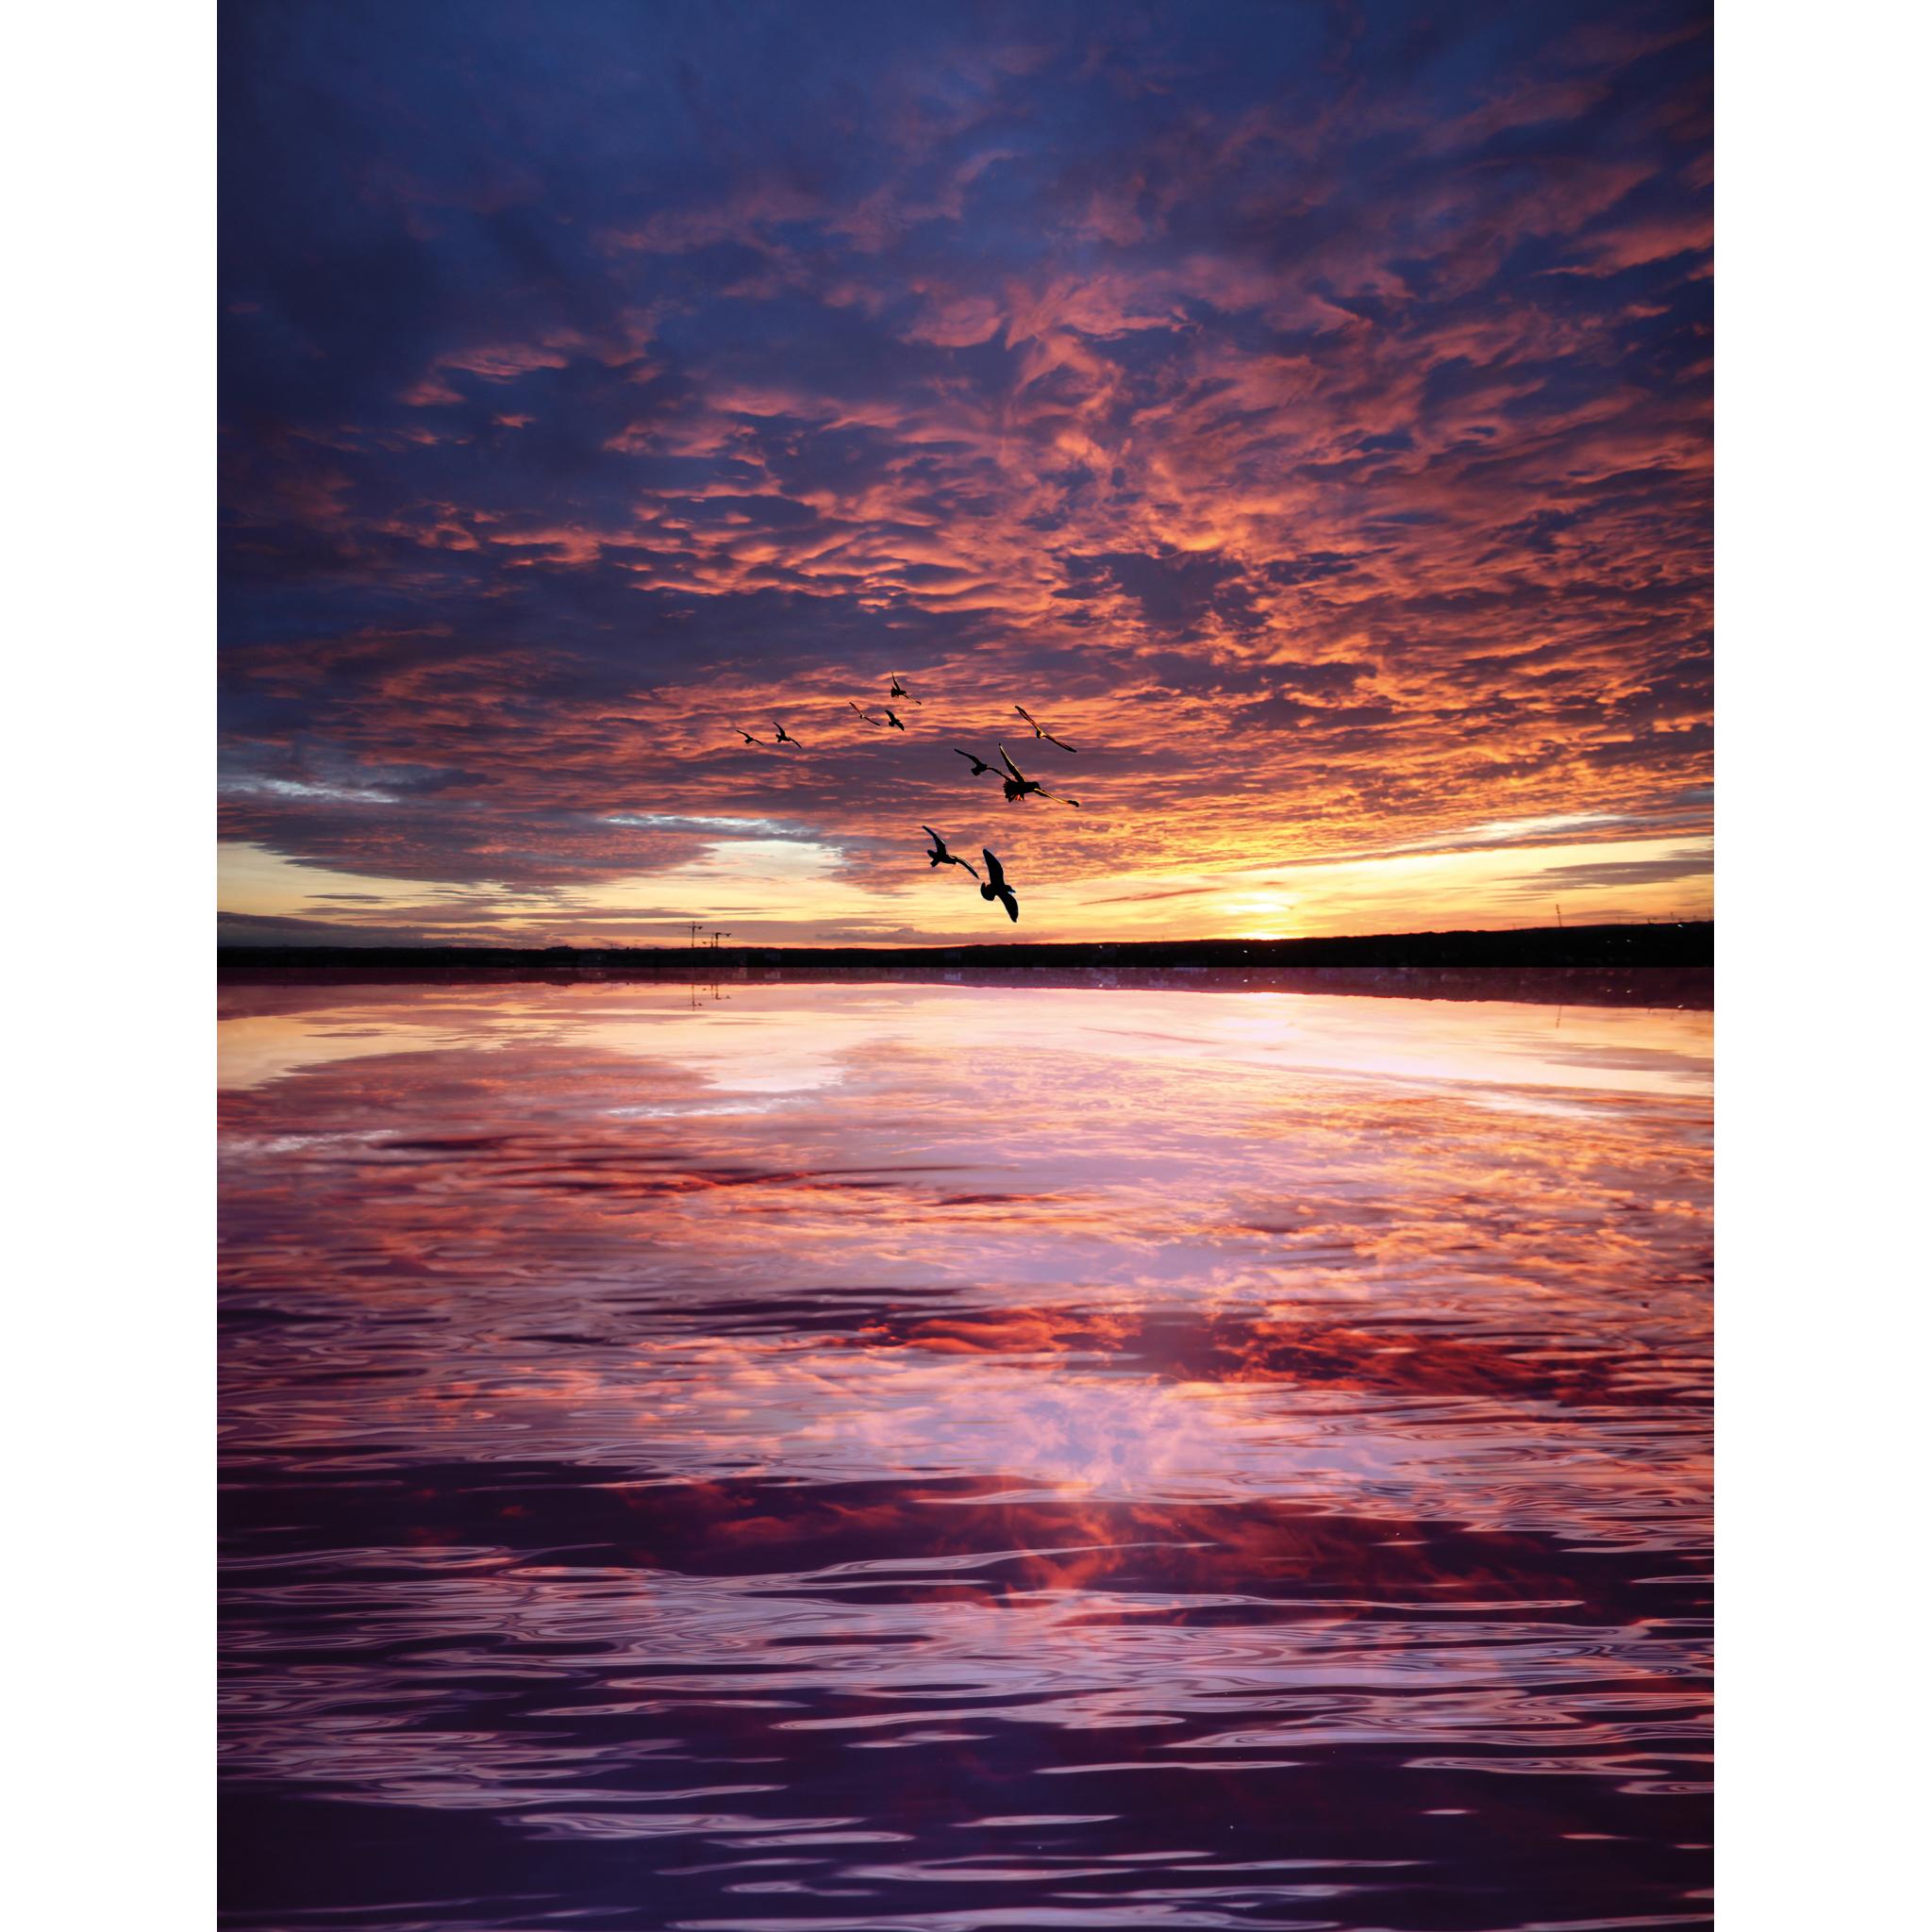 Reflektion, Wasser, Sonnenuntergang, Vögel, Red